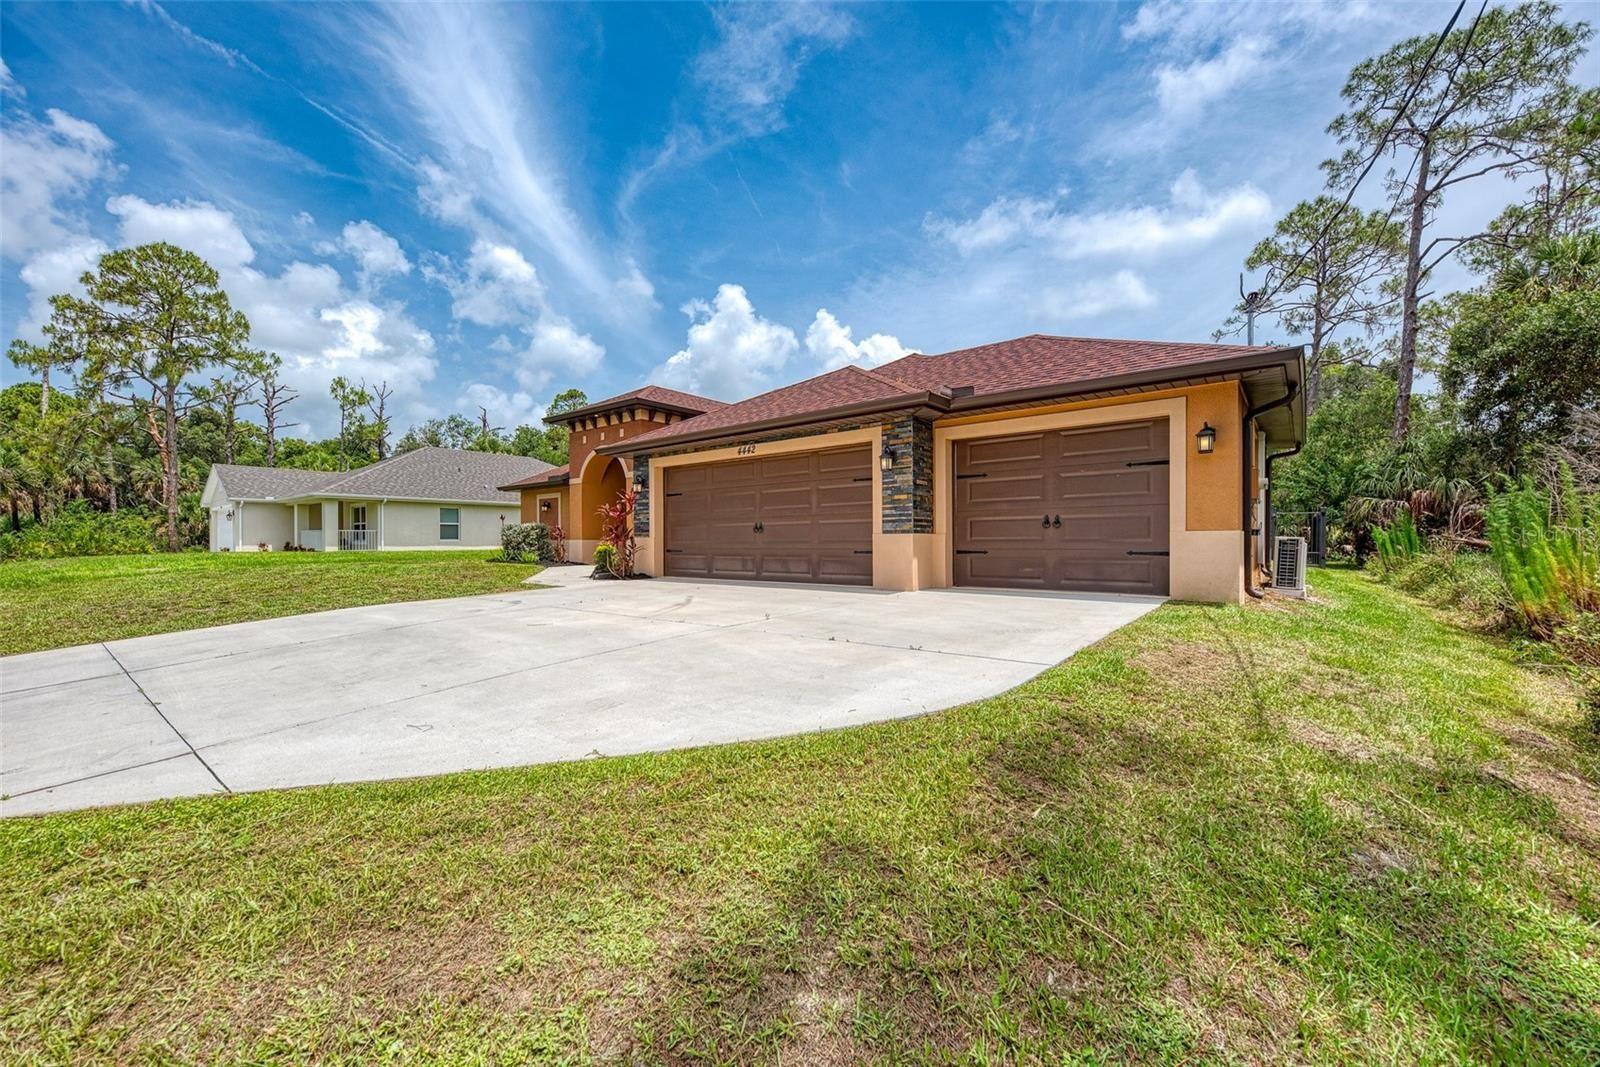 Photo of 4442 WINDSONG AVENUE, NORTH PORT, FL 34287 (MLS # D6119635)